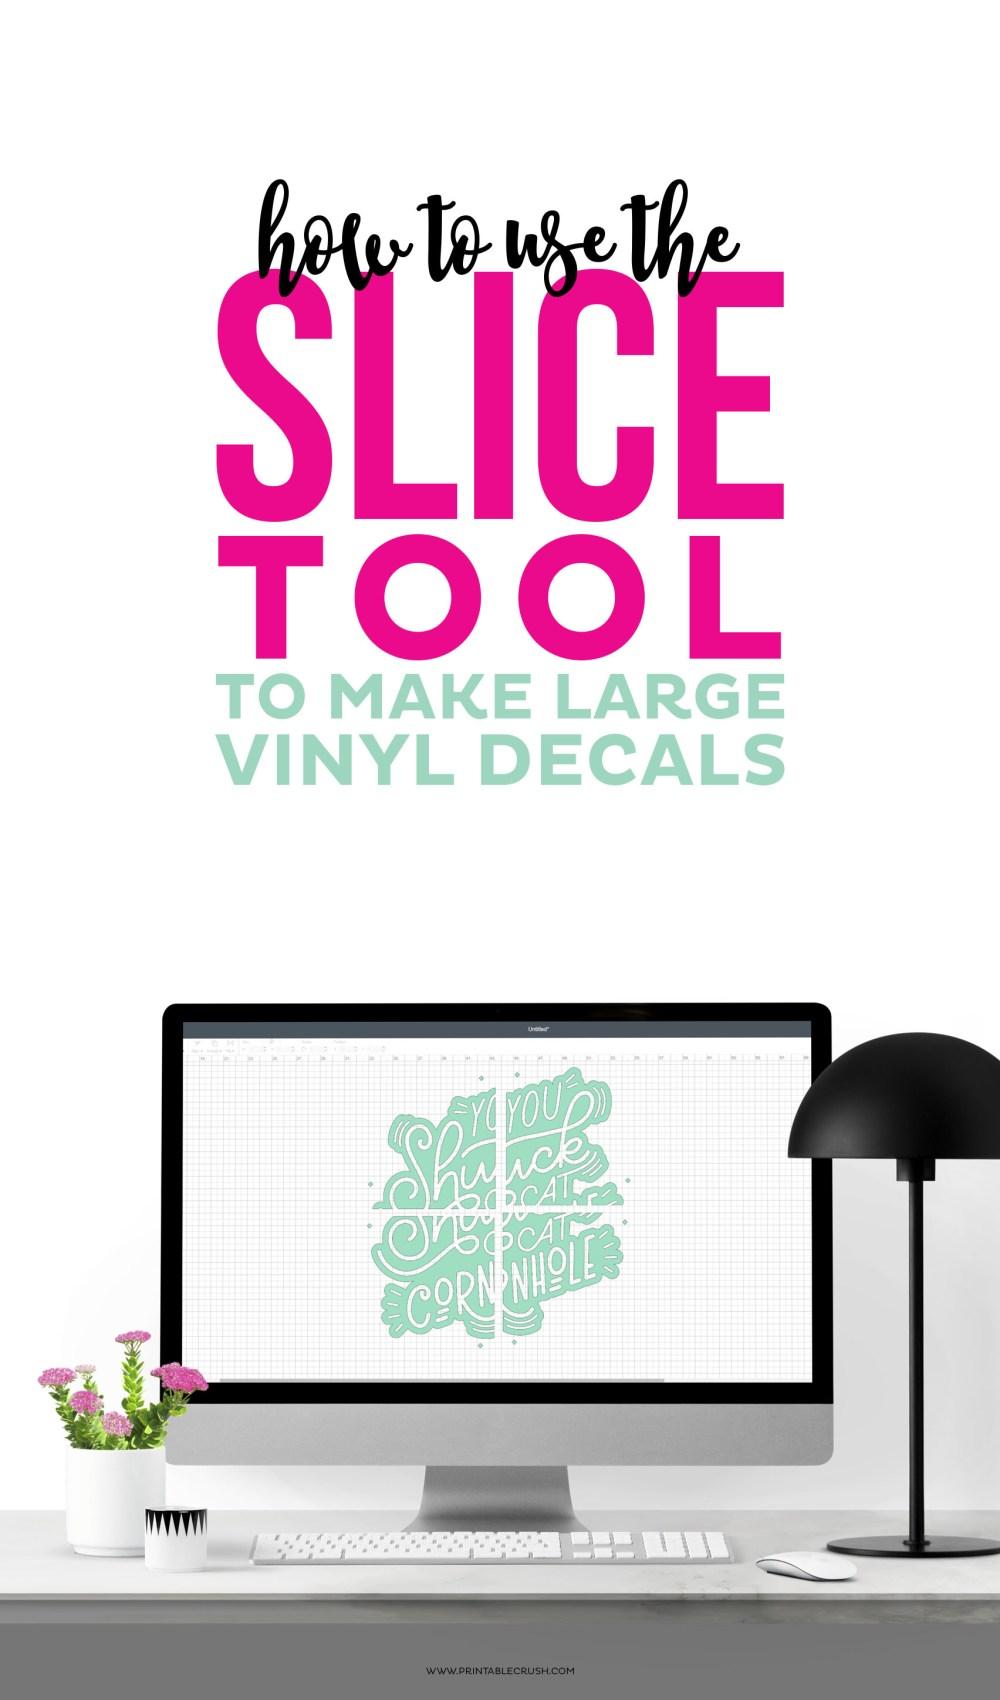 Vinyl decals art on Cricut design space canvas on computer